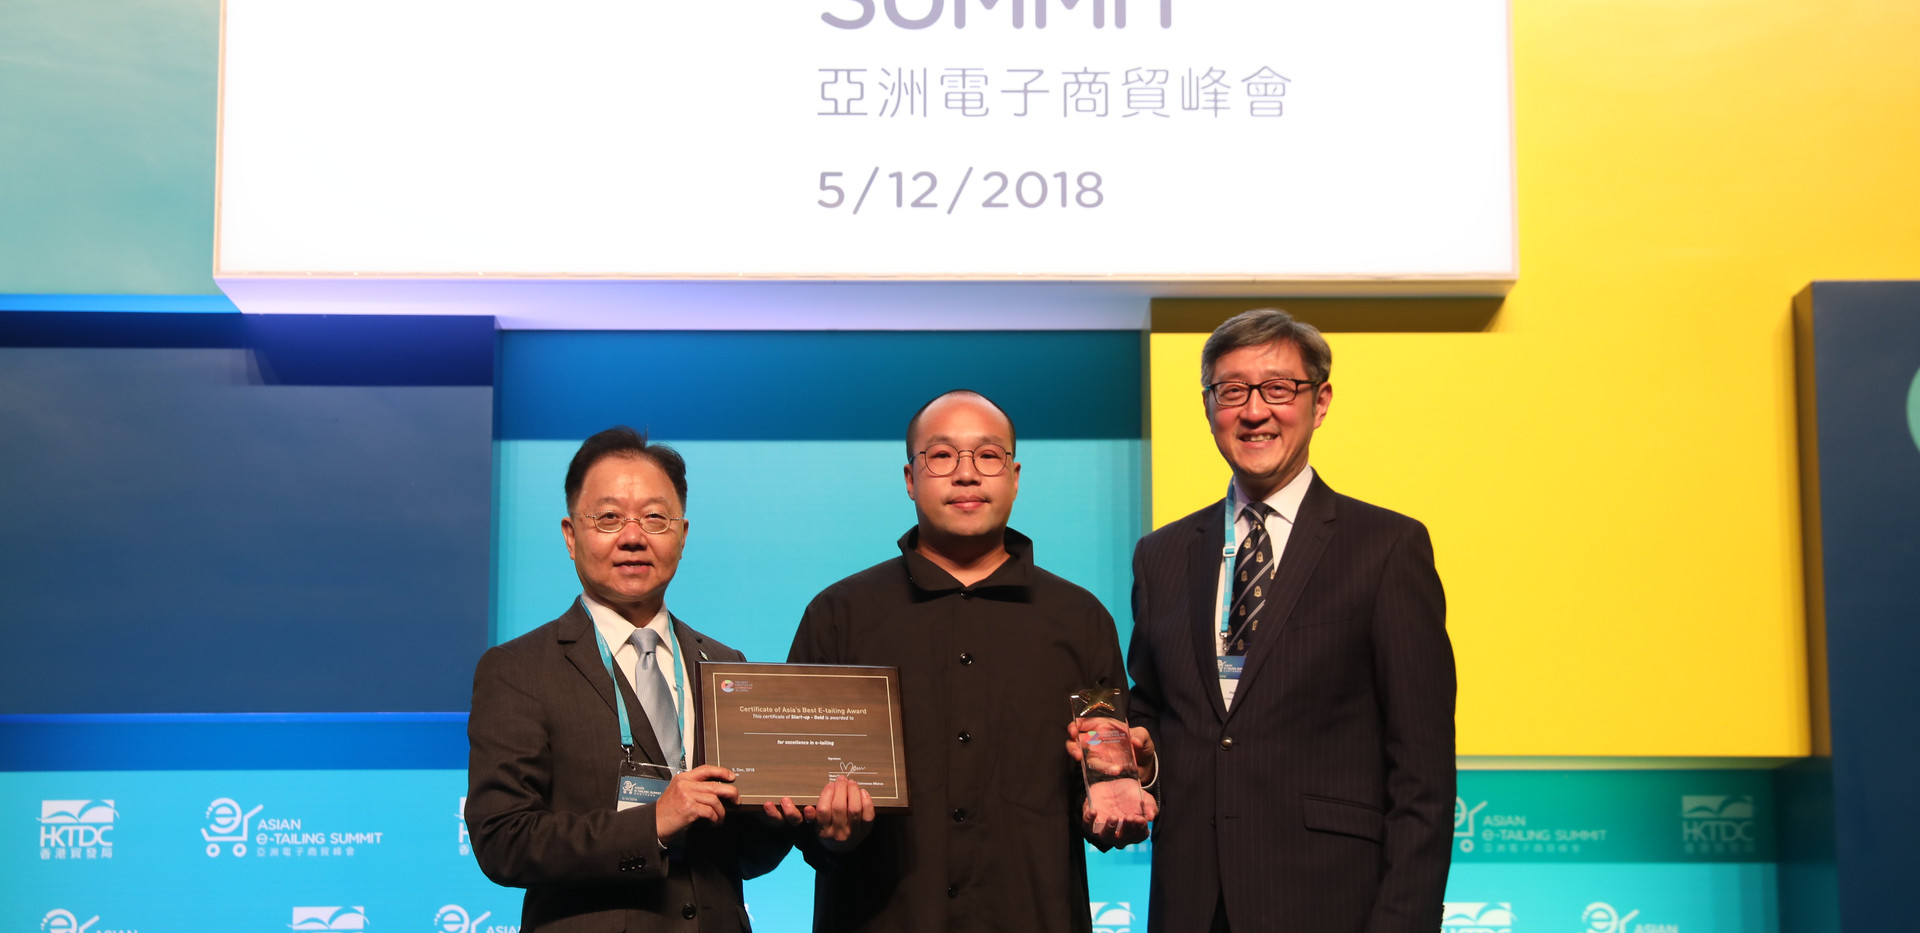 Loveramics - Winner of Startup - Gold